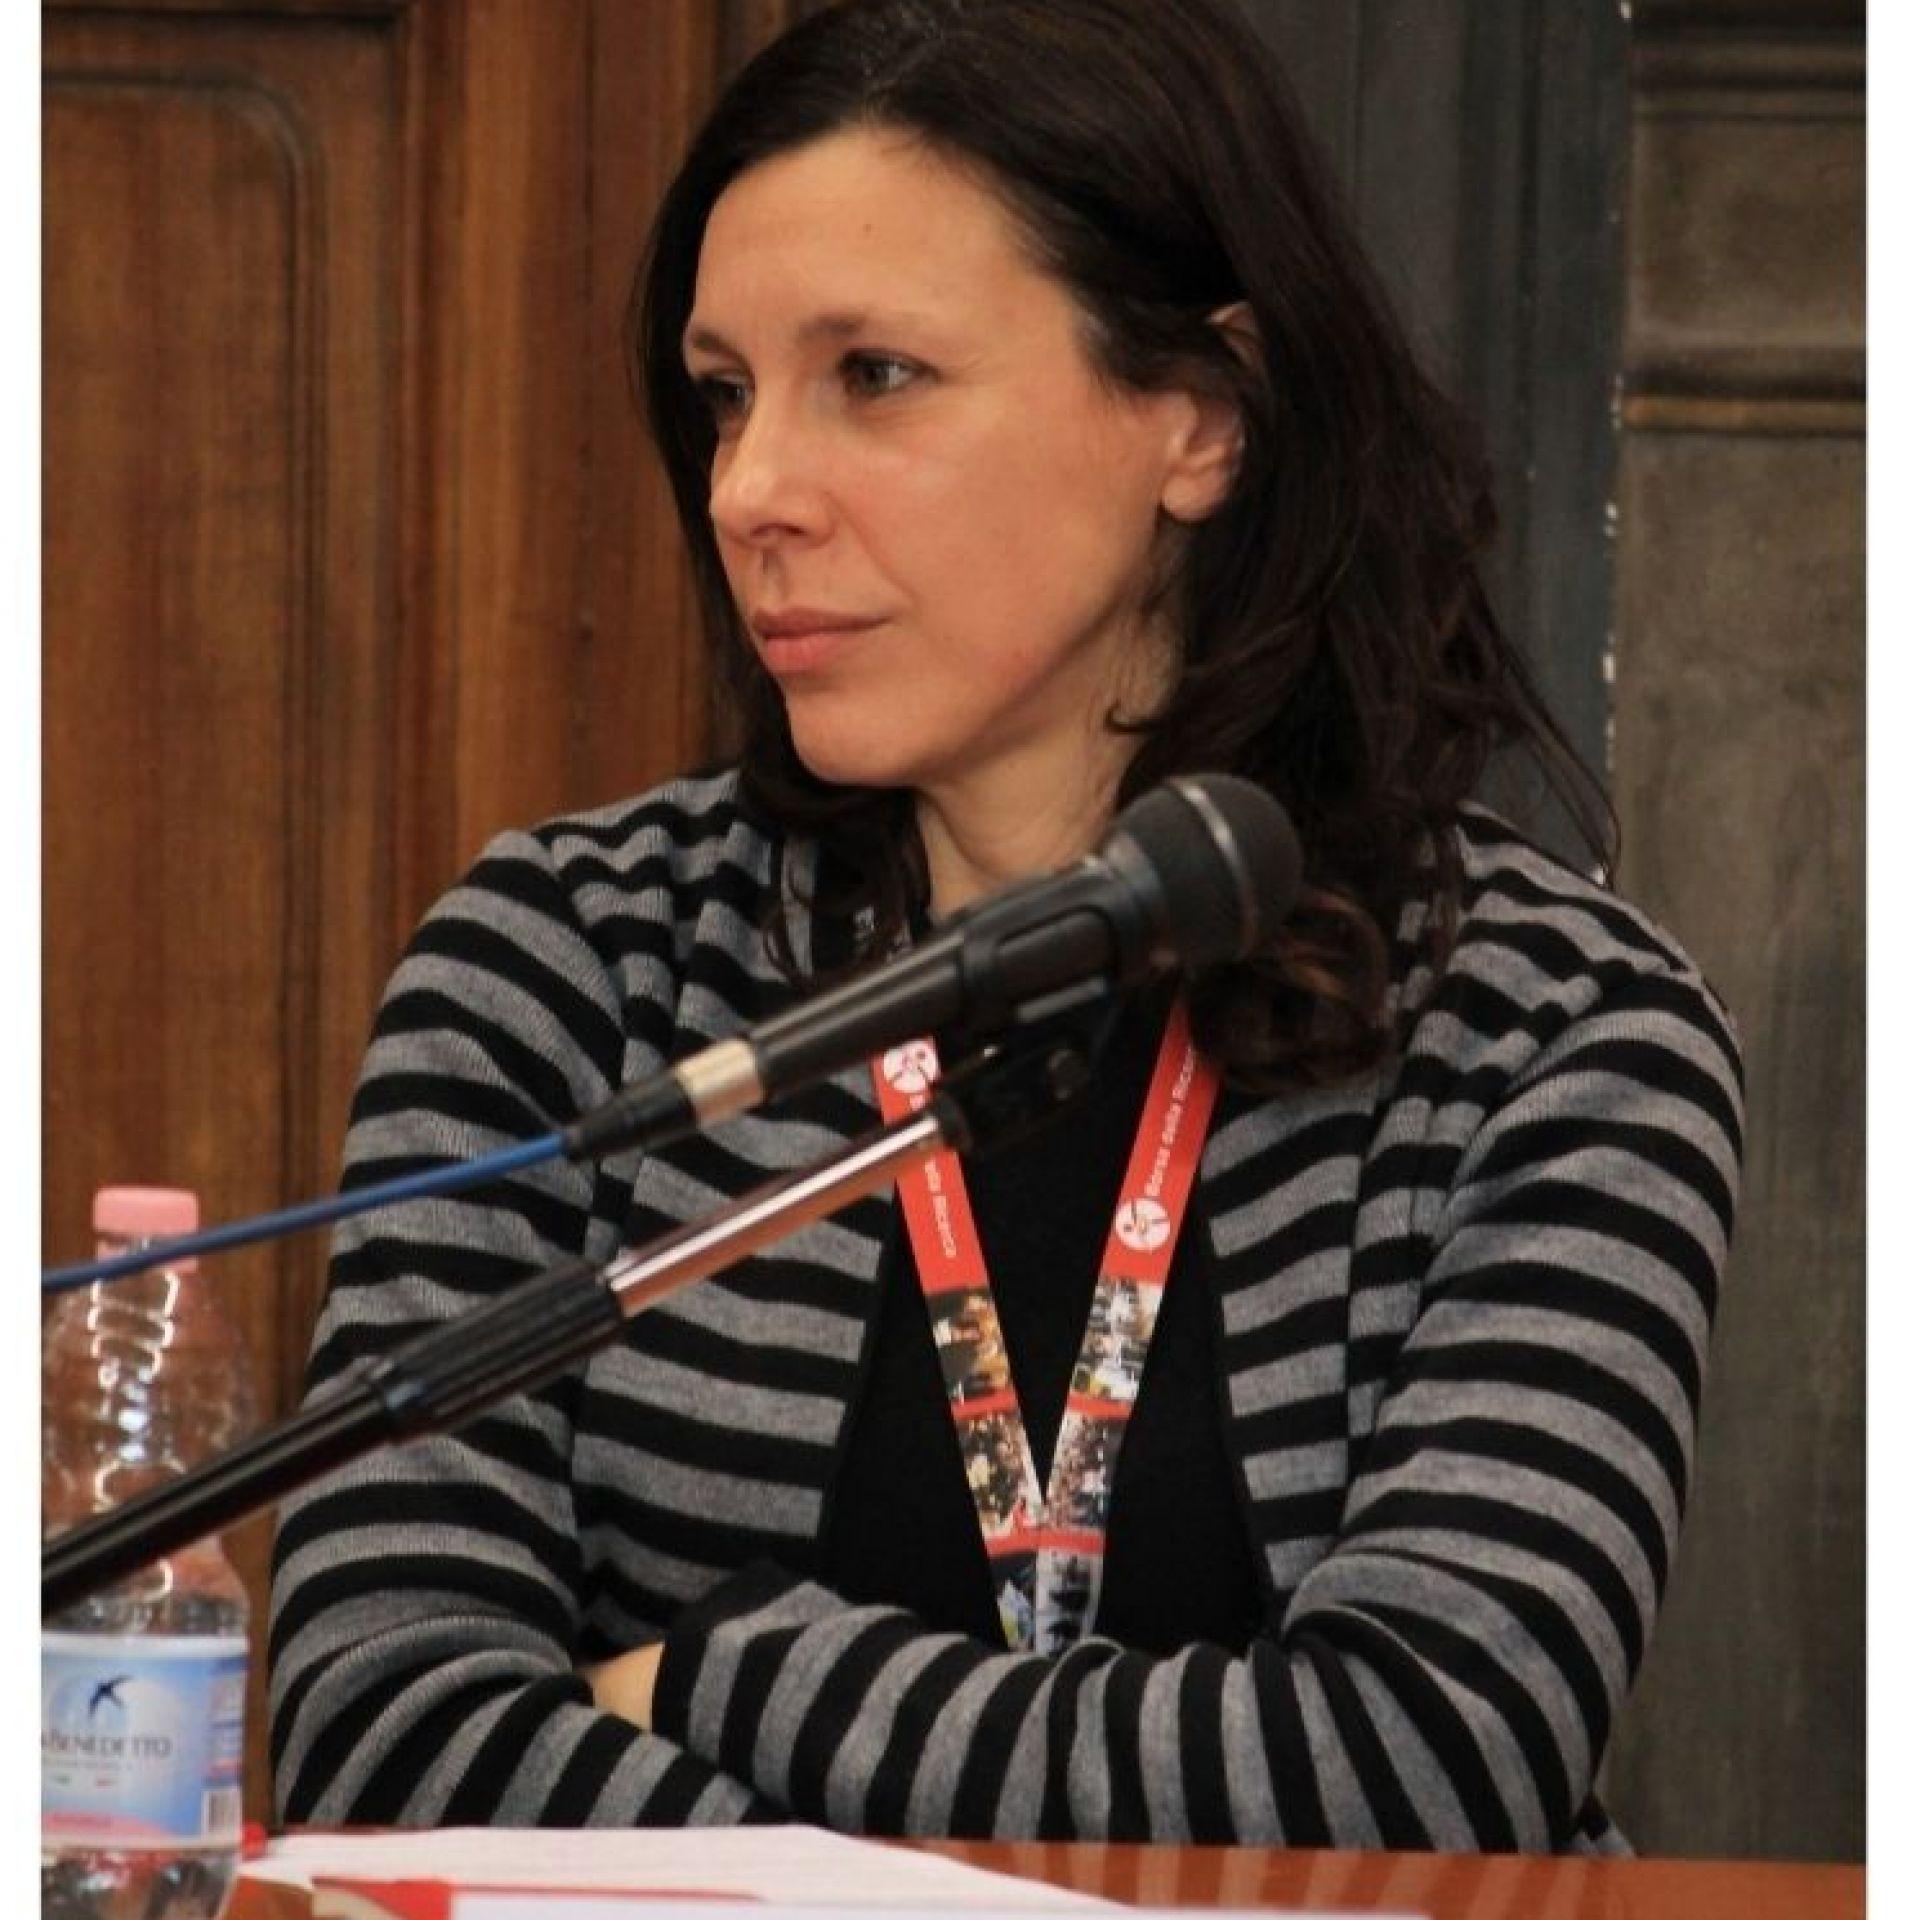 Valeria Fortin